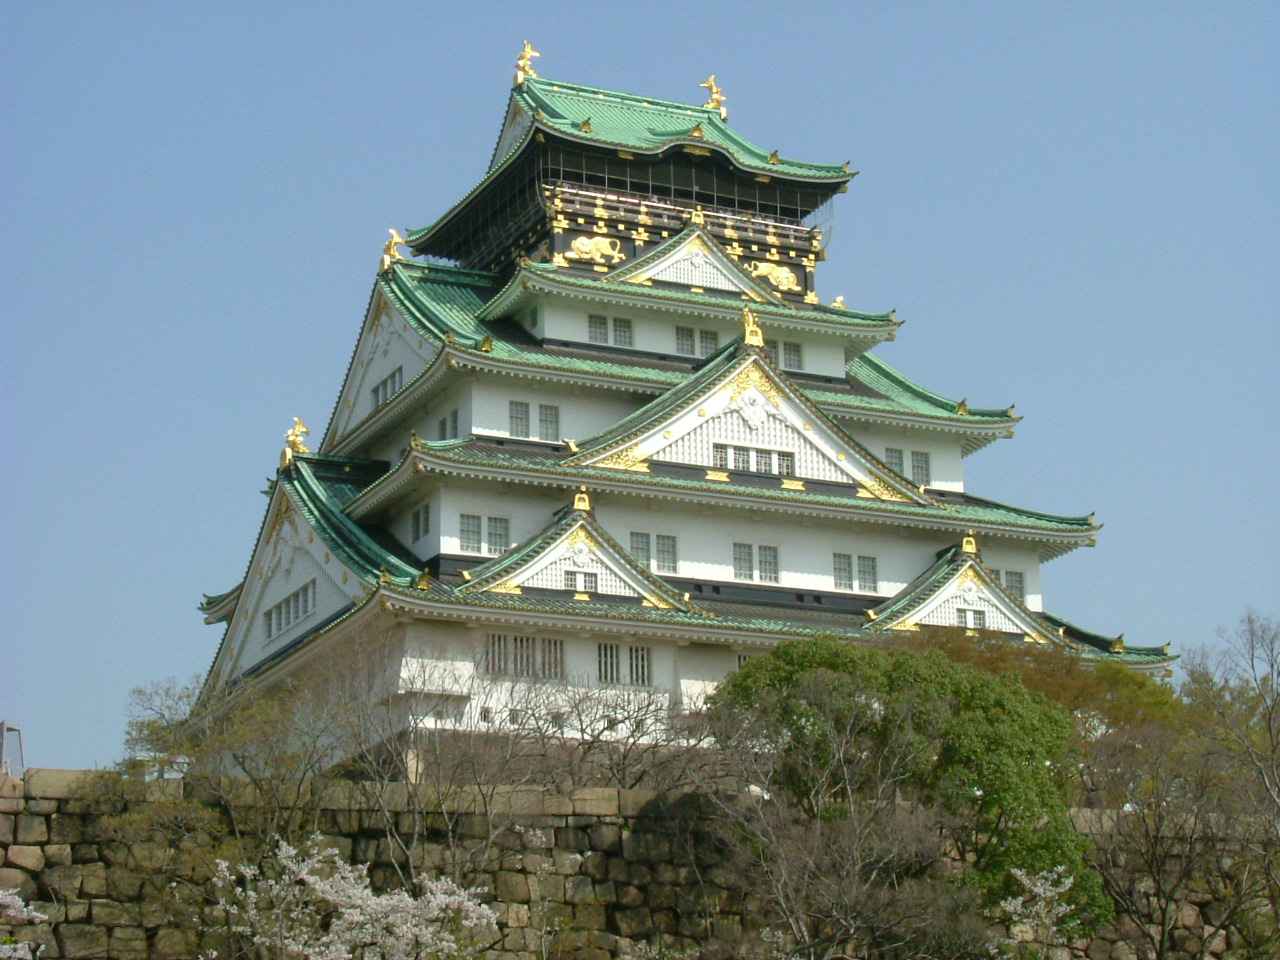 http://upload.wikimedia.org/wikipedia/commons/a/ac/Osaka_Castle_Nishinomaru_Garden_April_2005.JPG